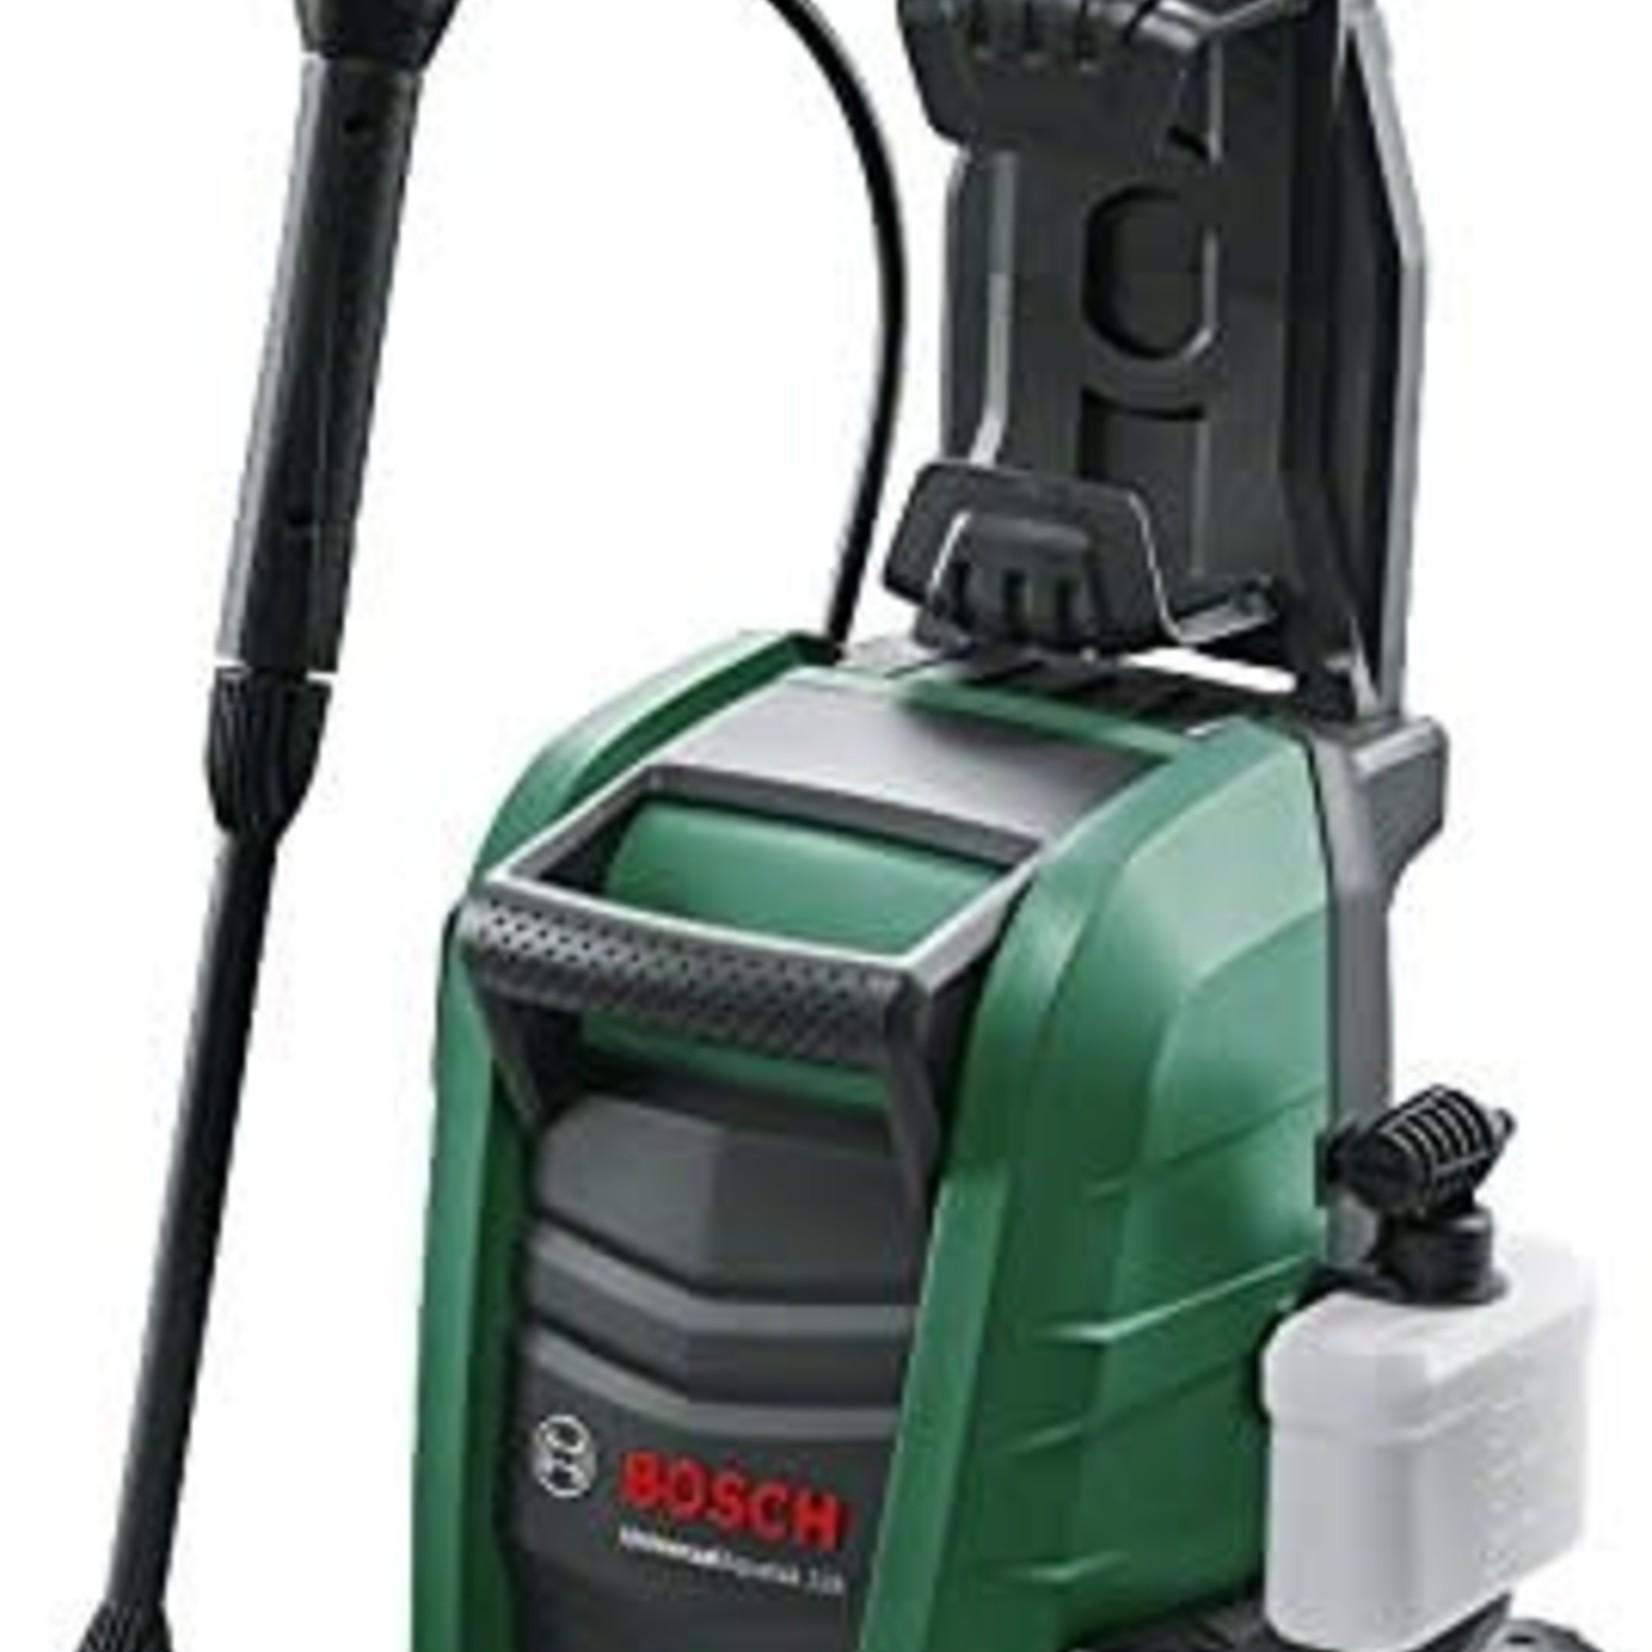 Bosch Bosch Aquatak125 Pressure Washer